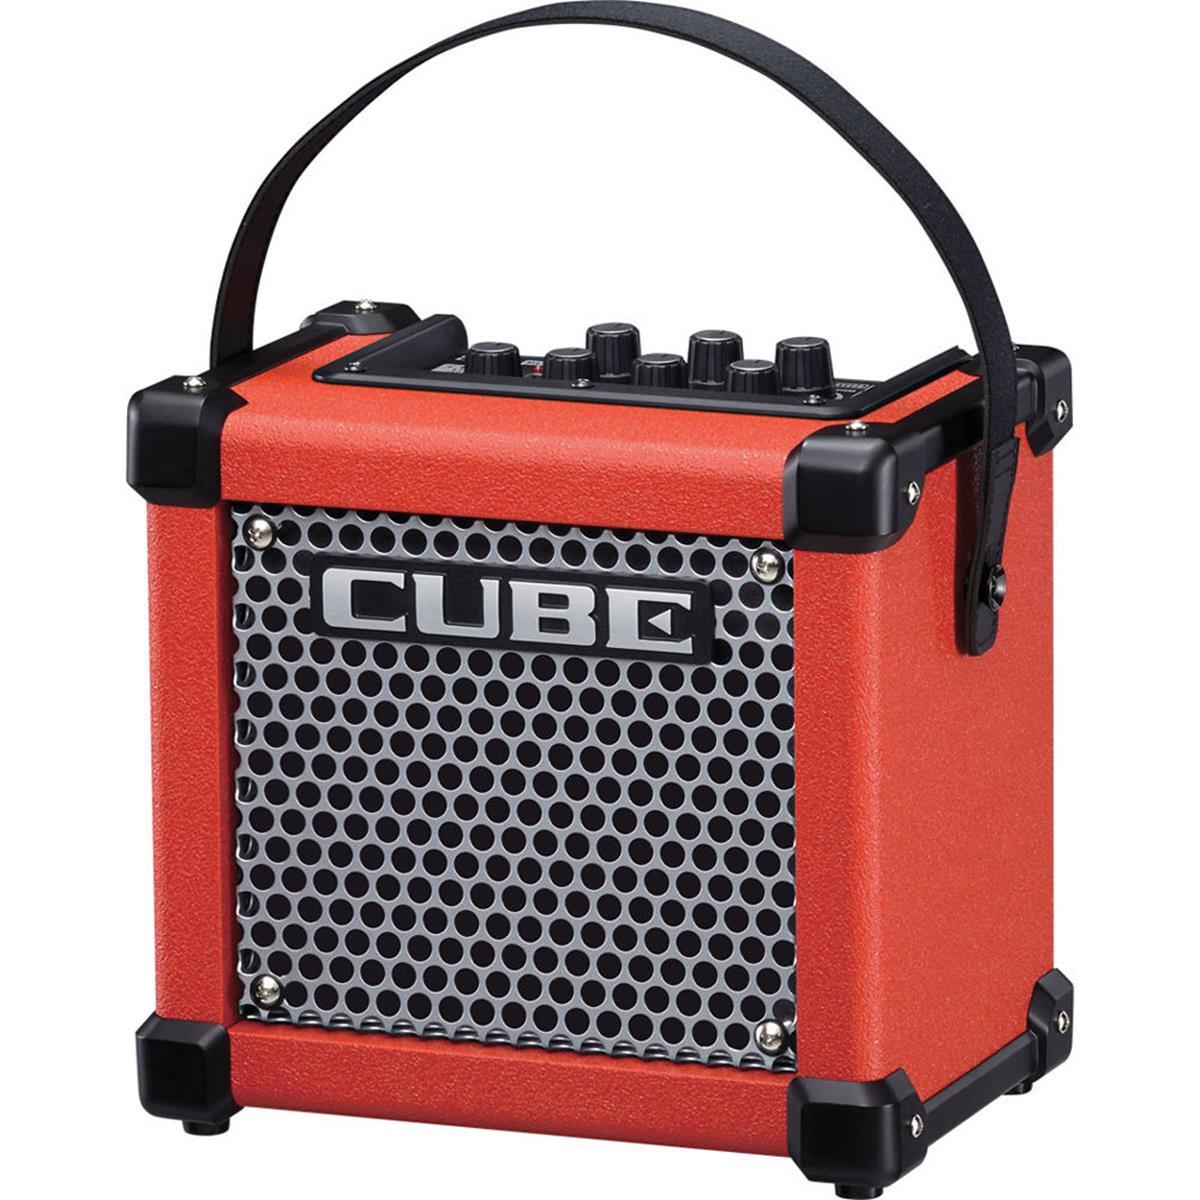 ROLAND-MCUBE-MICRO-CUBE-GX-RED-new-sku-10390